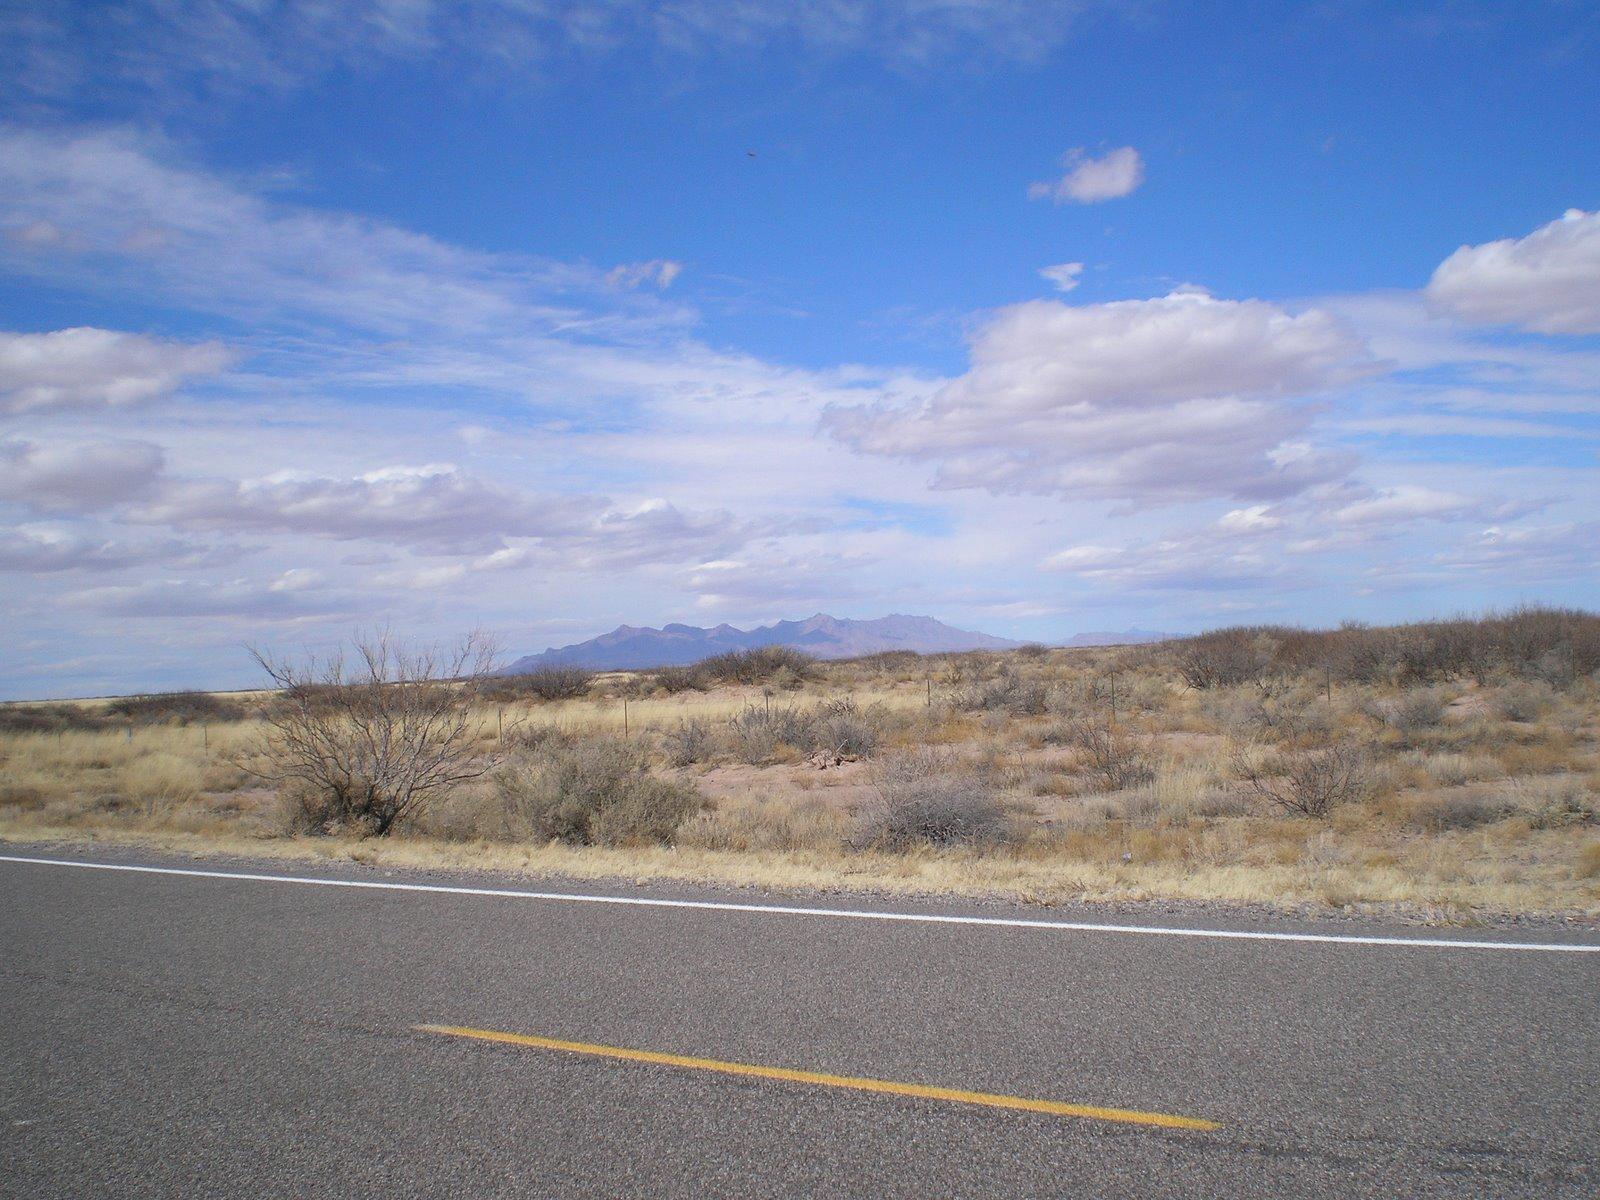 Straight Road Horizontal | www.imgkid.com - The Image Kid ...